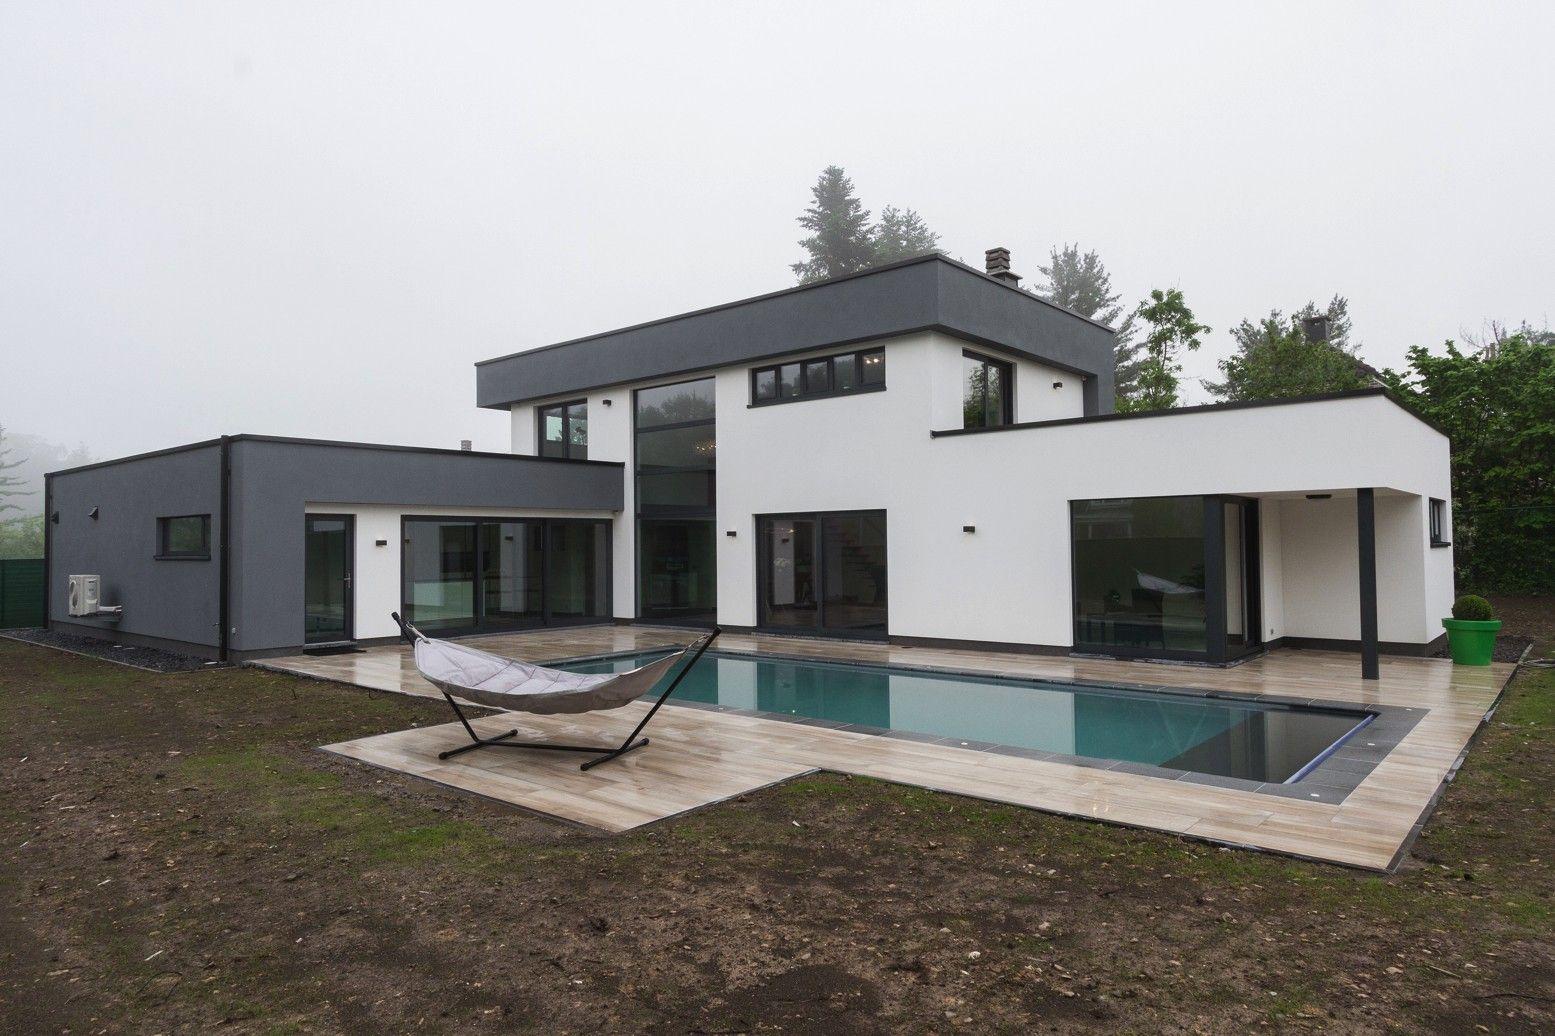 maison contemporaine à Beaufays   Hausideen in 2019   Modern house ...